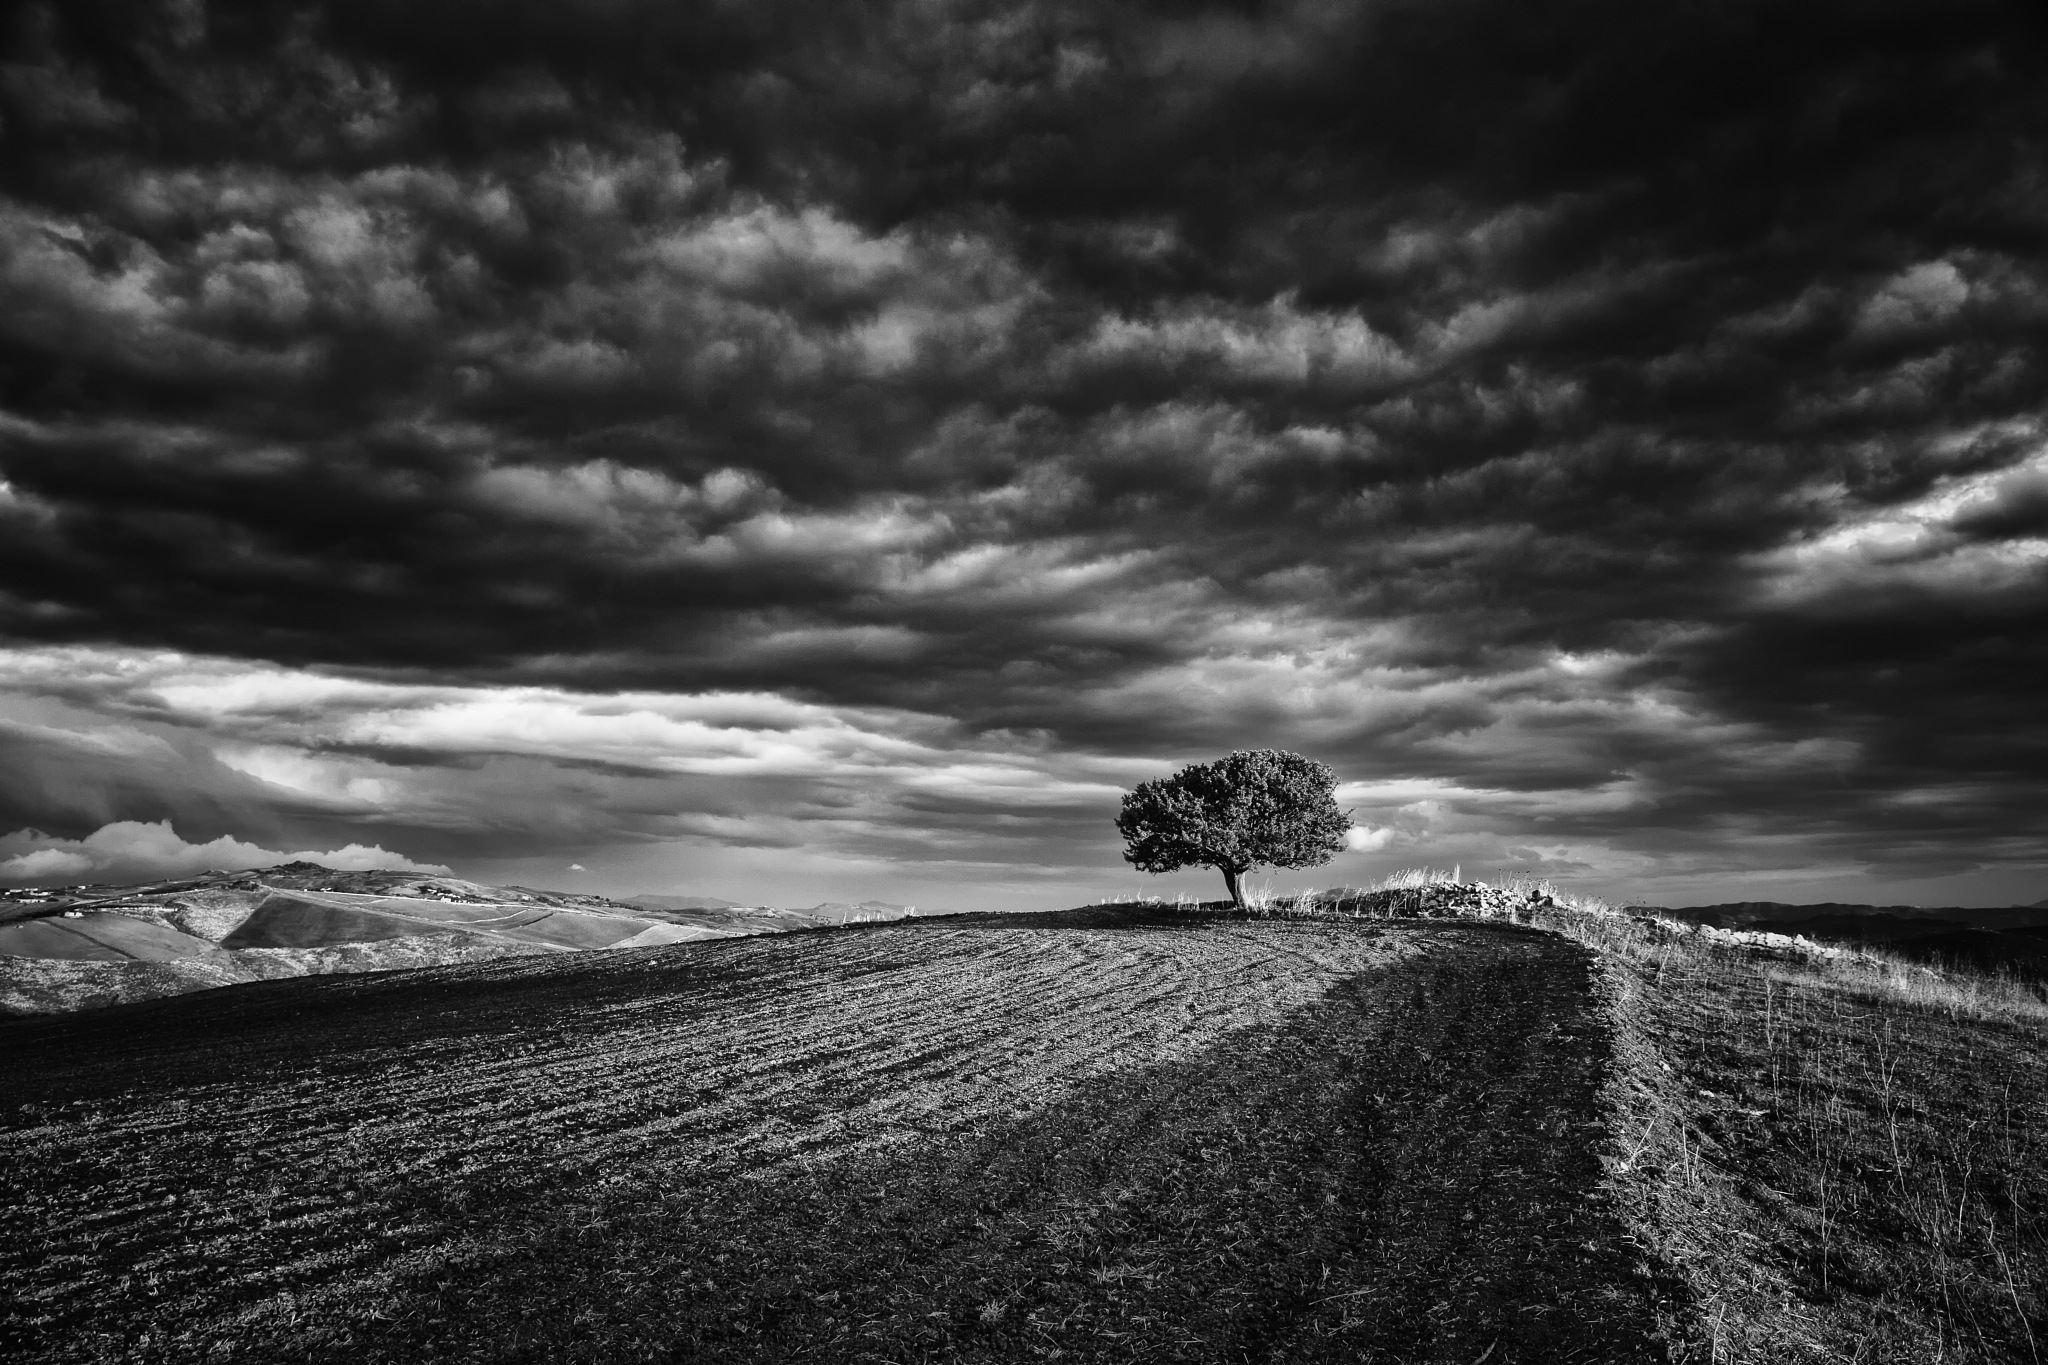 L'ABBANDONO... by Tommaso